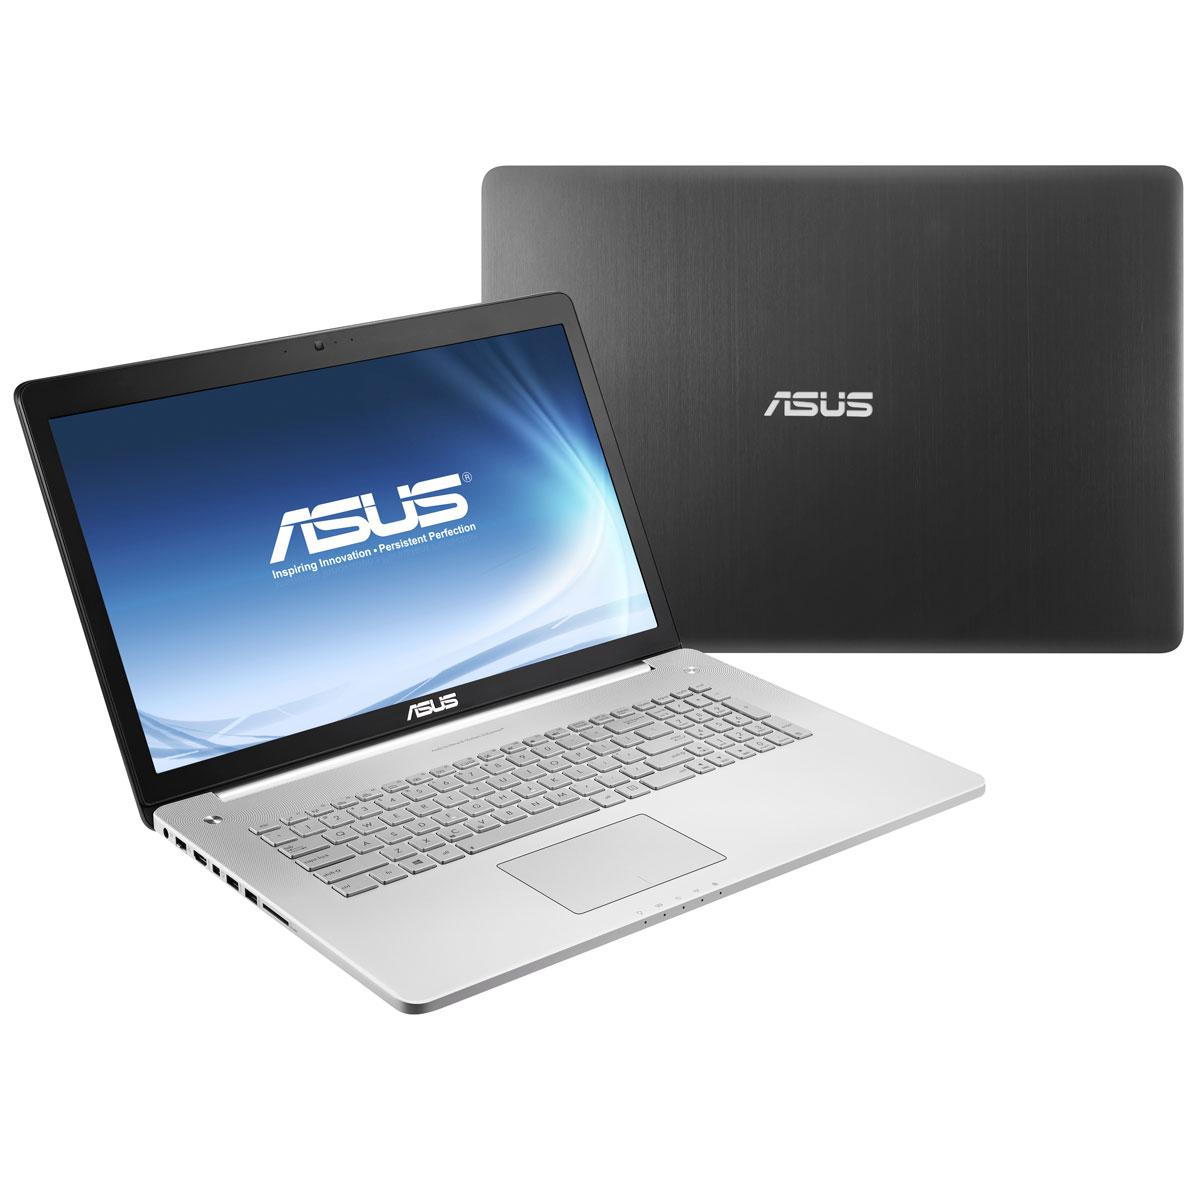 "PC portable ASUS N750JV-T4213H Intel Core i7-4700HQ 6 Go 750 Go 17.3"" LED NVIDIA GeForce GT 750M Graveur DVD Wi-Fi N/Bluetooth Webcam Windows 8 64 bits (garantie constructeur 1 an)"